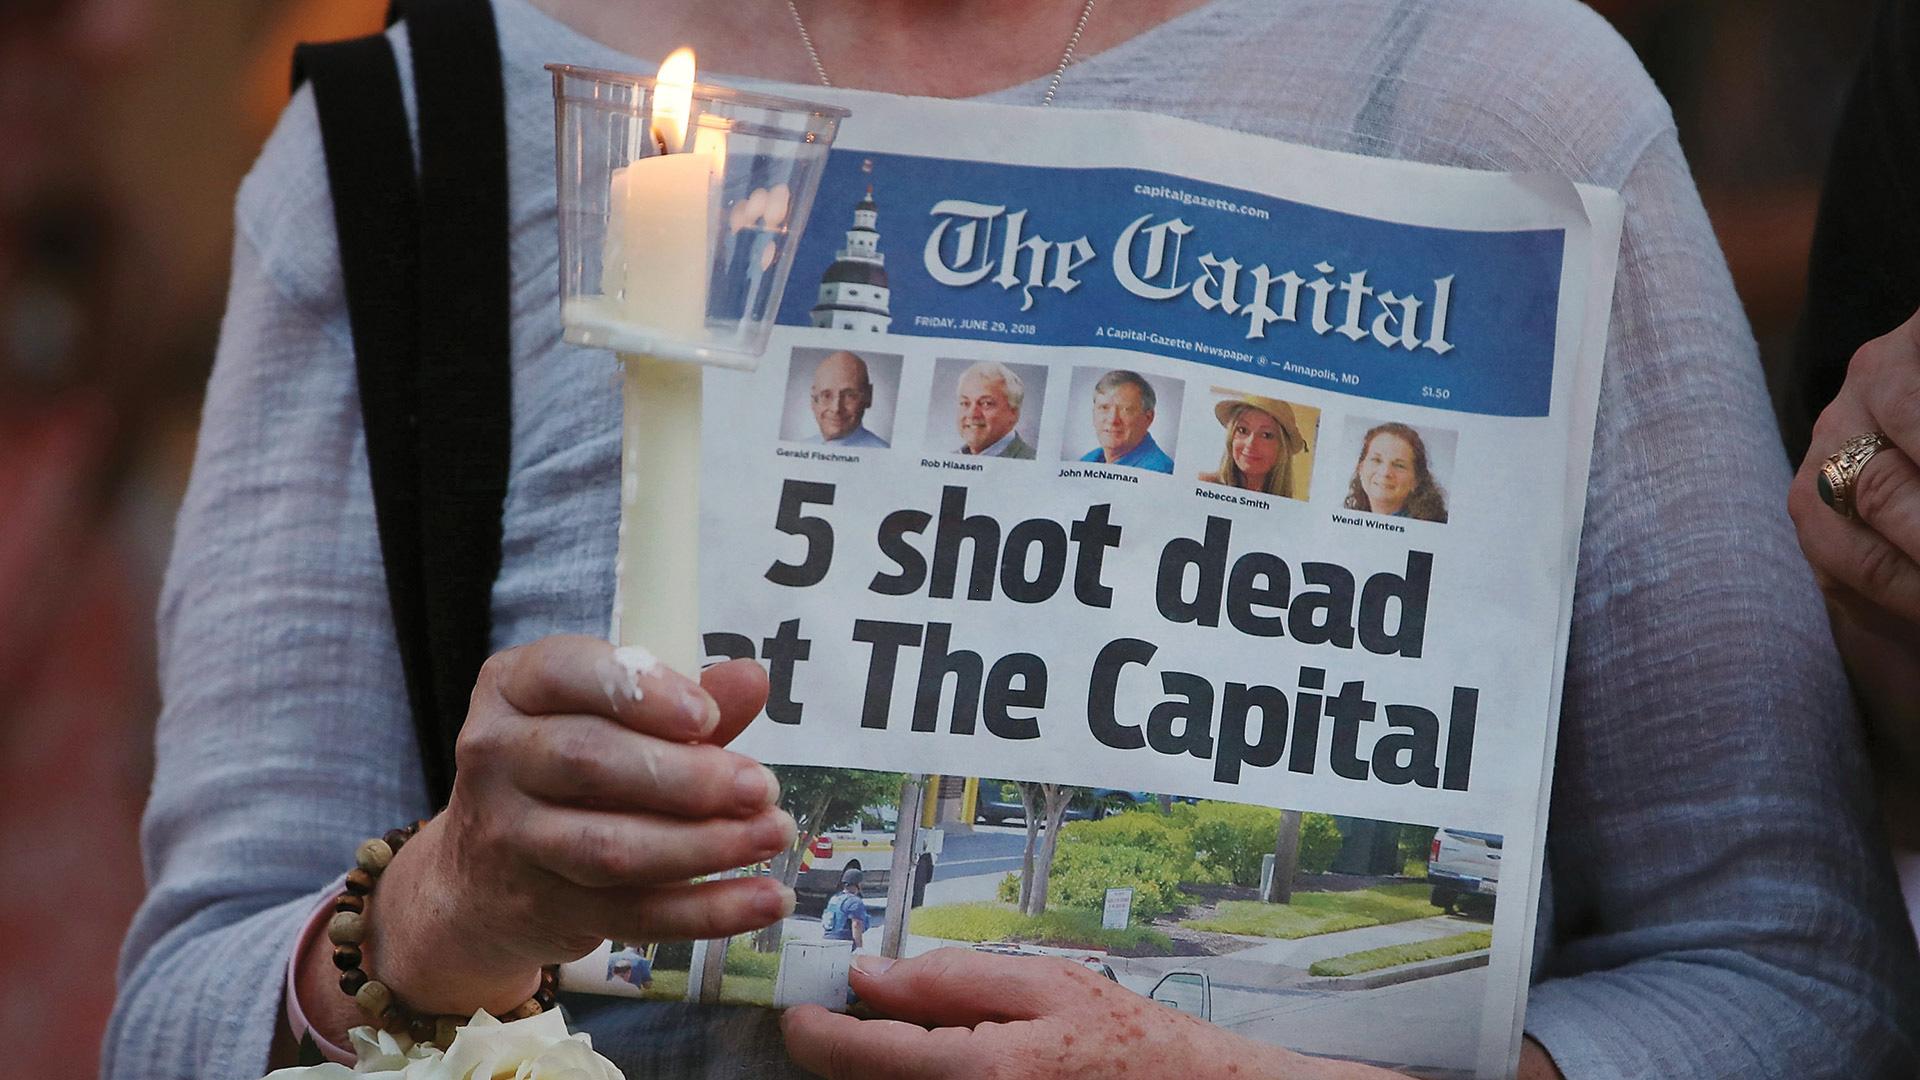 UMD to Memorialize Capital Gazette Shooting Victims